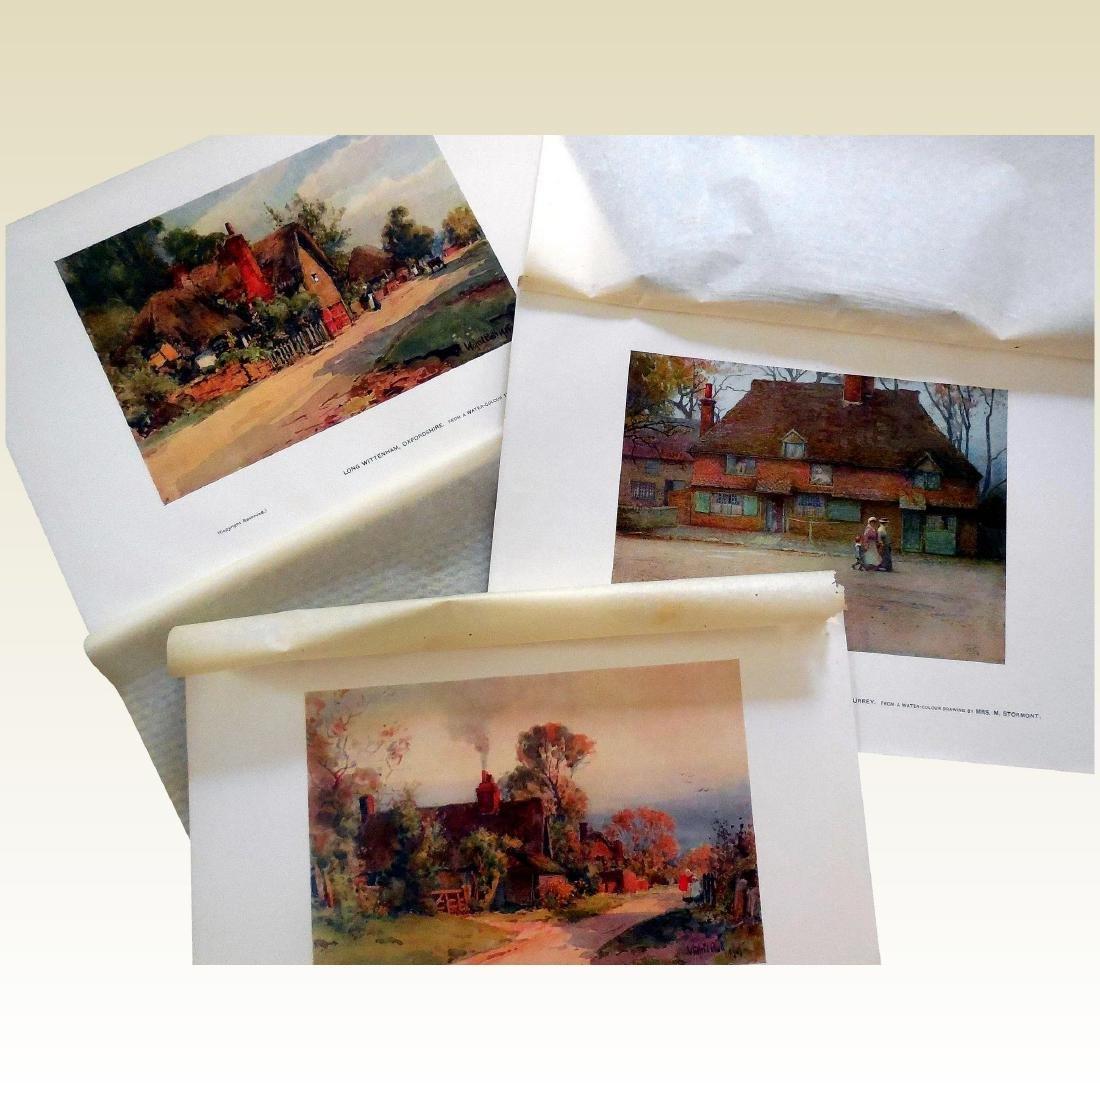 Antique Prints of English Cottages